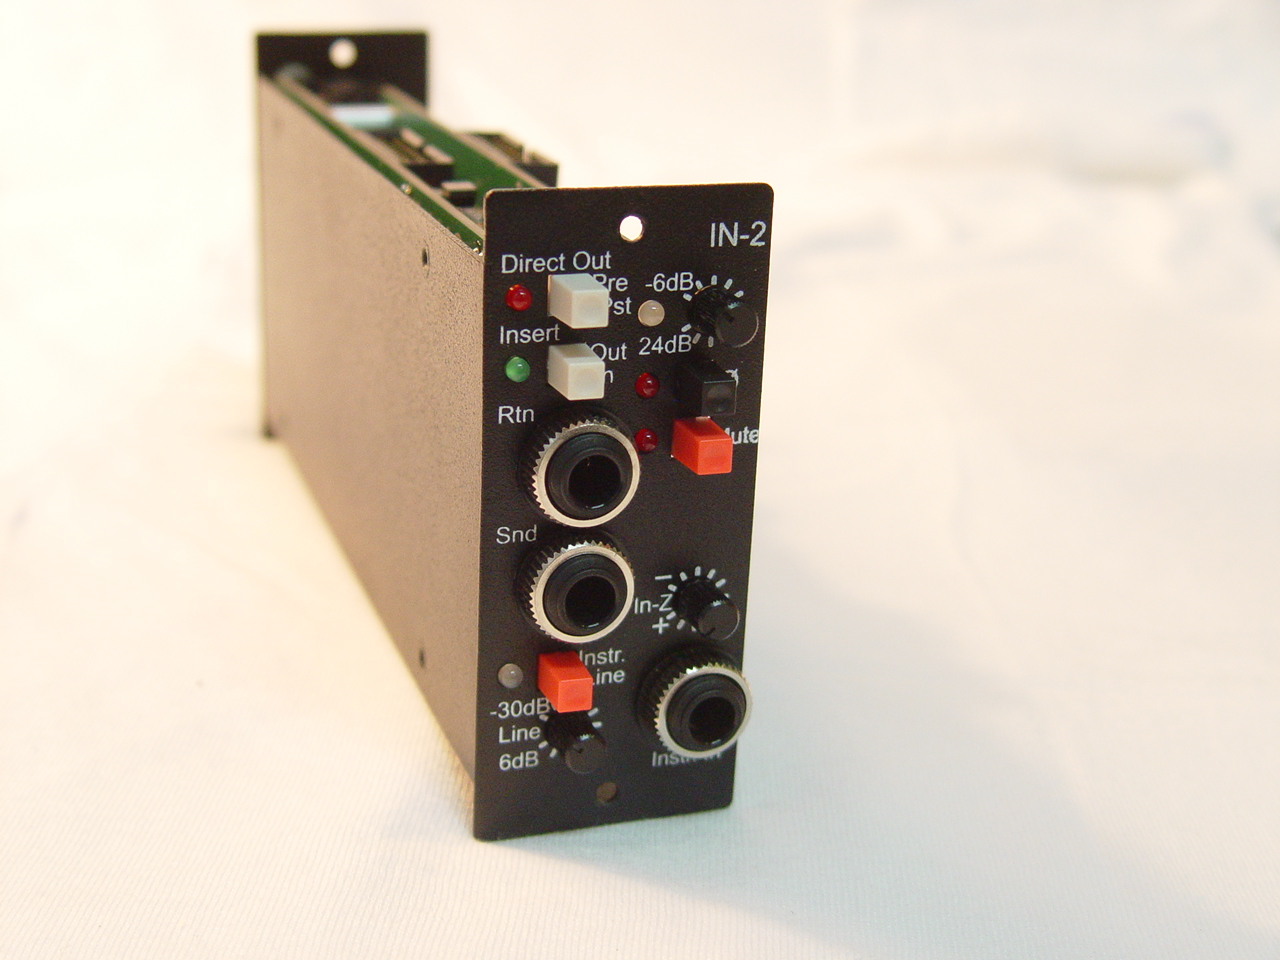 Sentinel PRIME - IN-2 Module